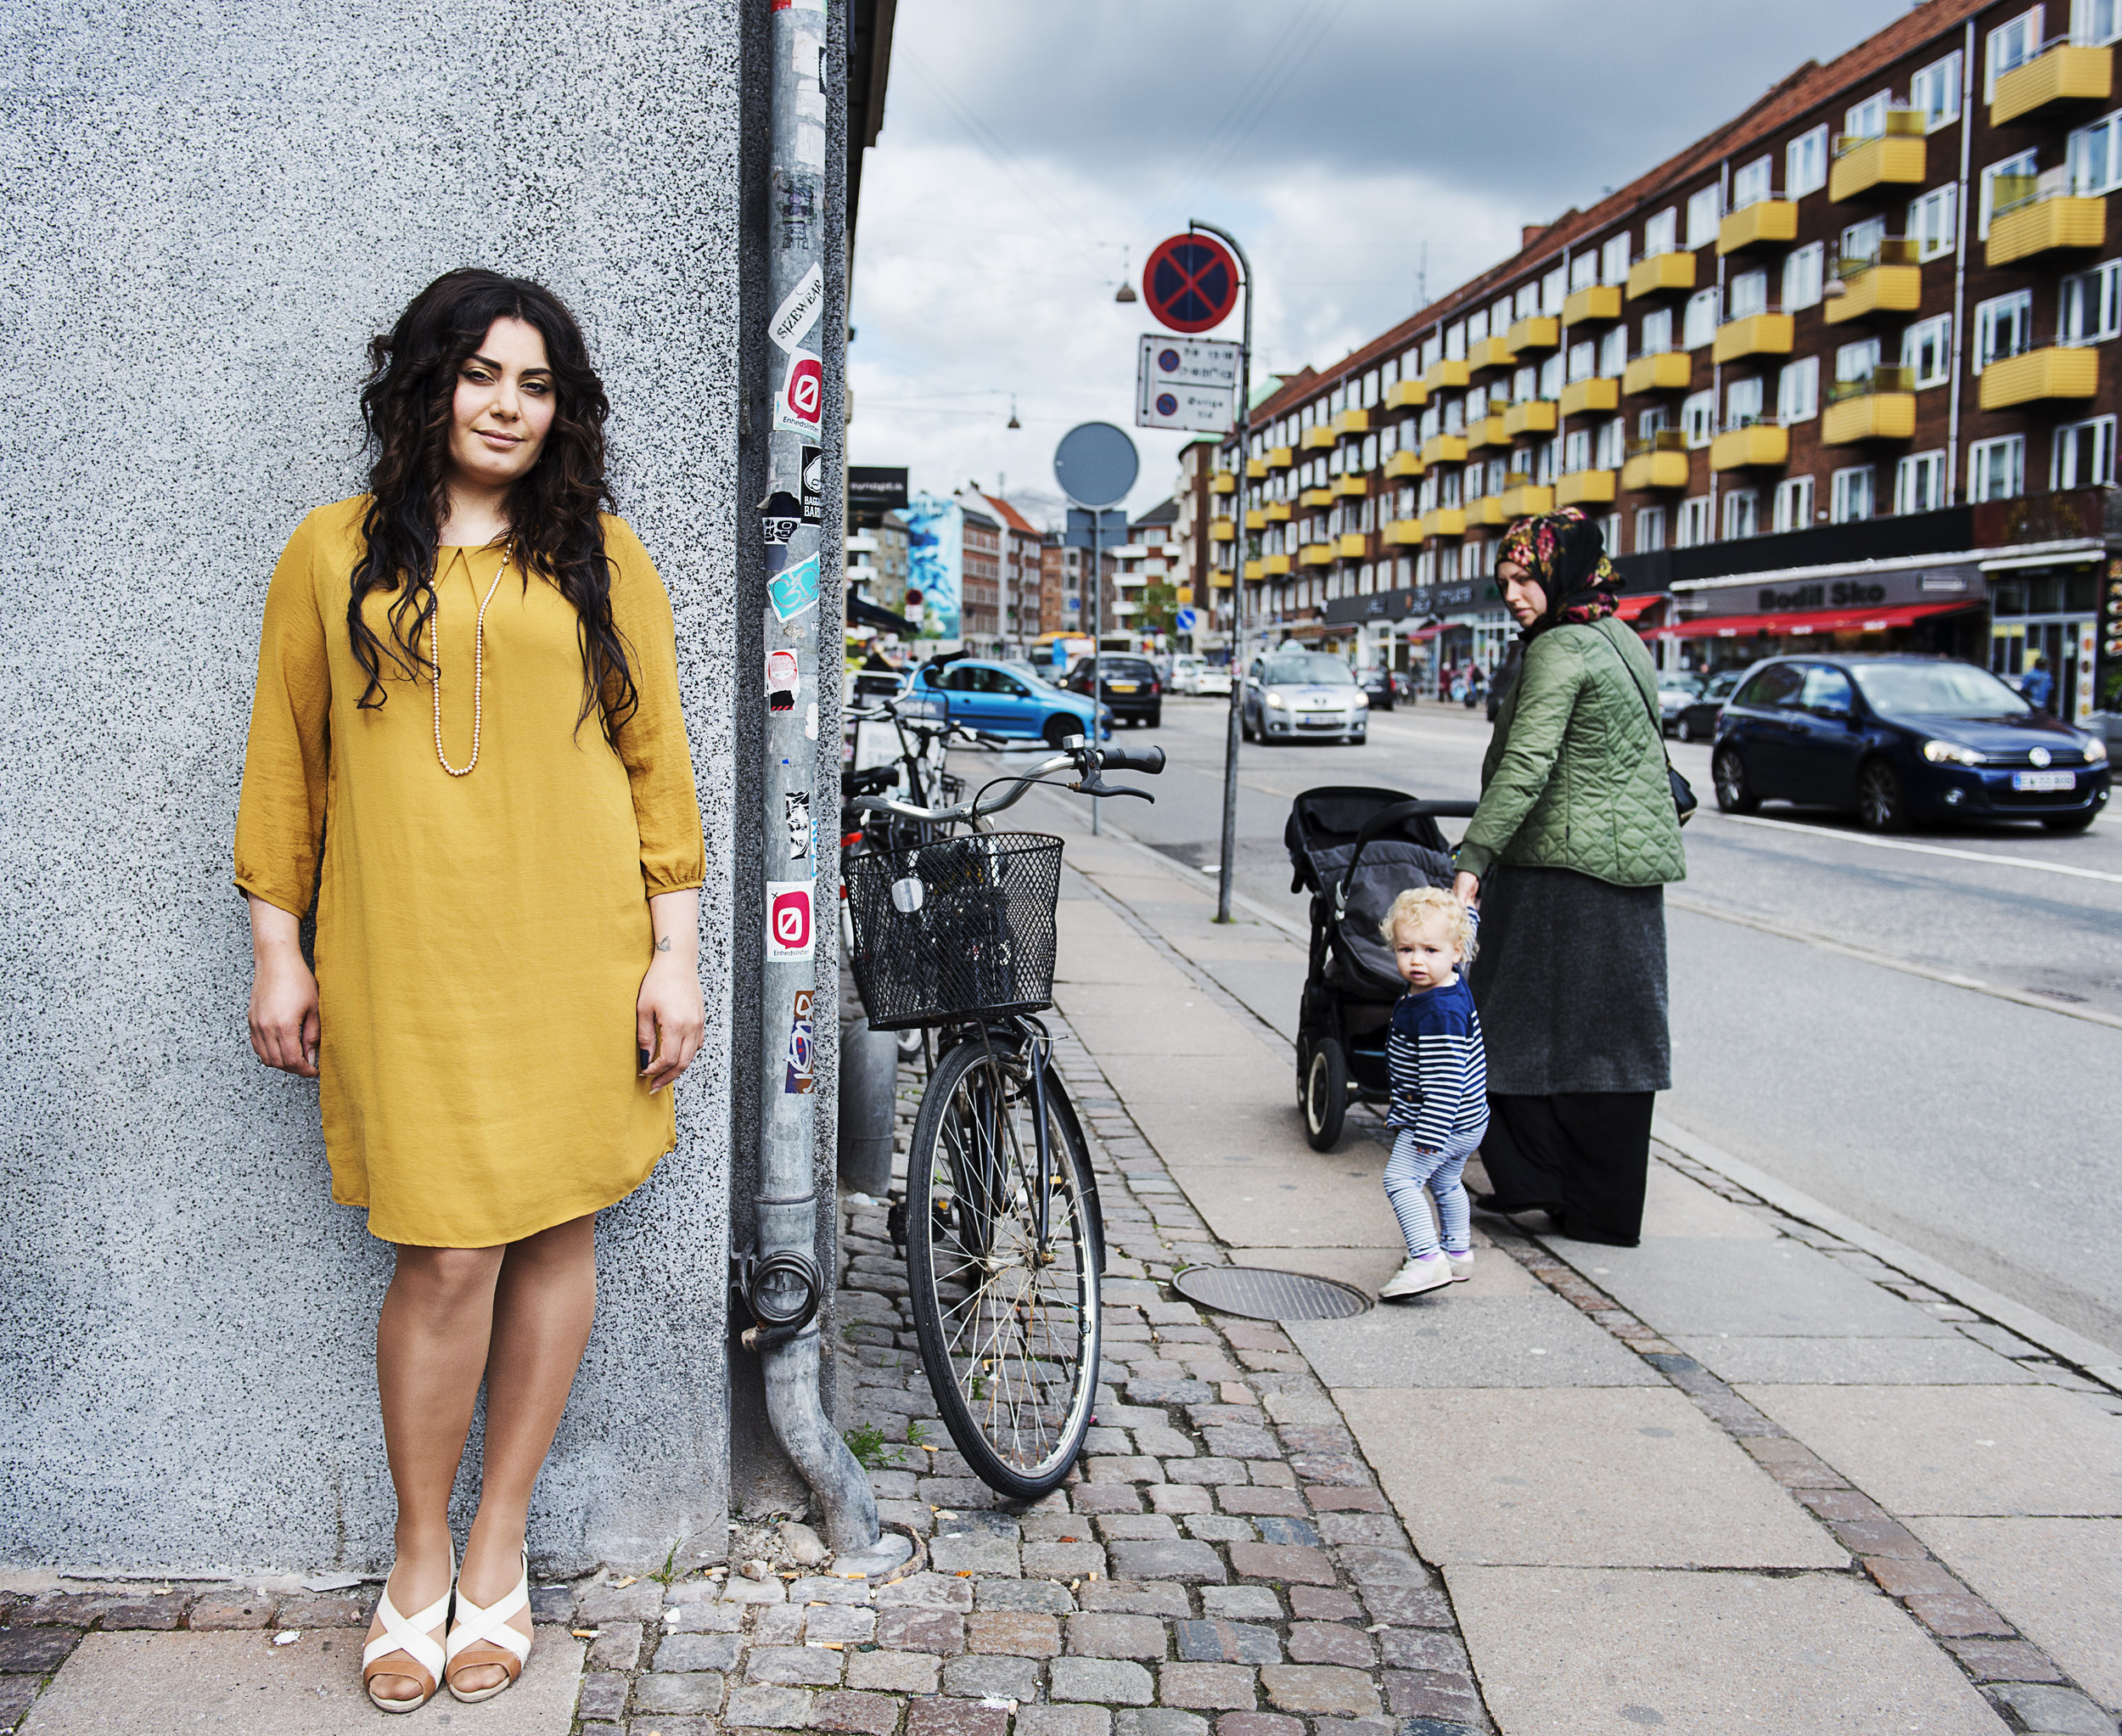 Anahita Neshati Malakians, kandidat for venstre